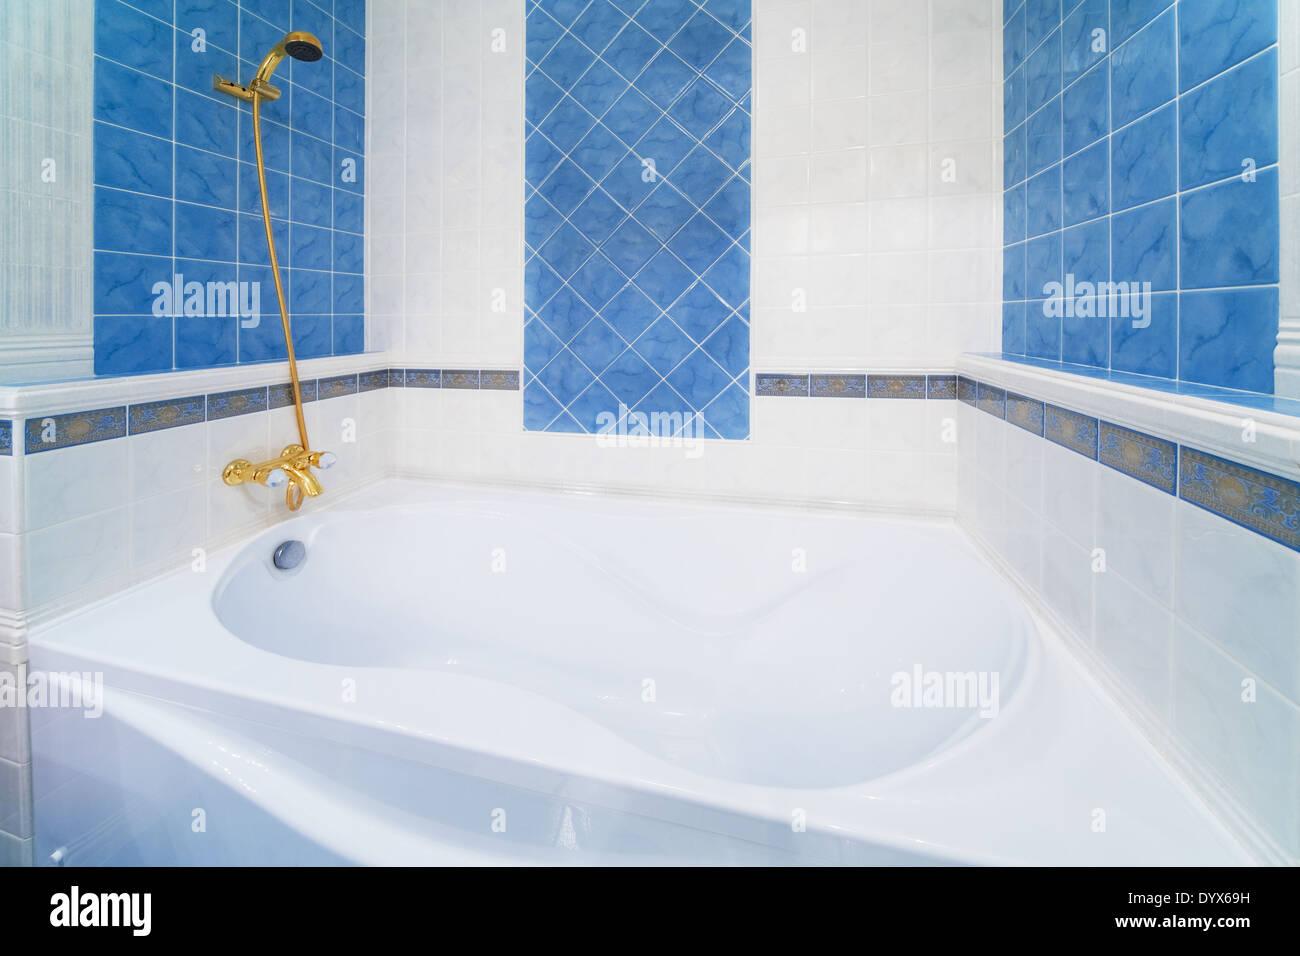 Beautiful Modern Tile Showers Gift - Bathtub Design Ideas - klotsnet.com